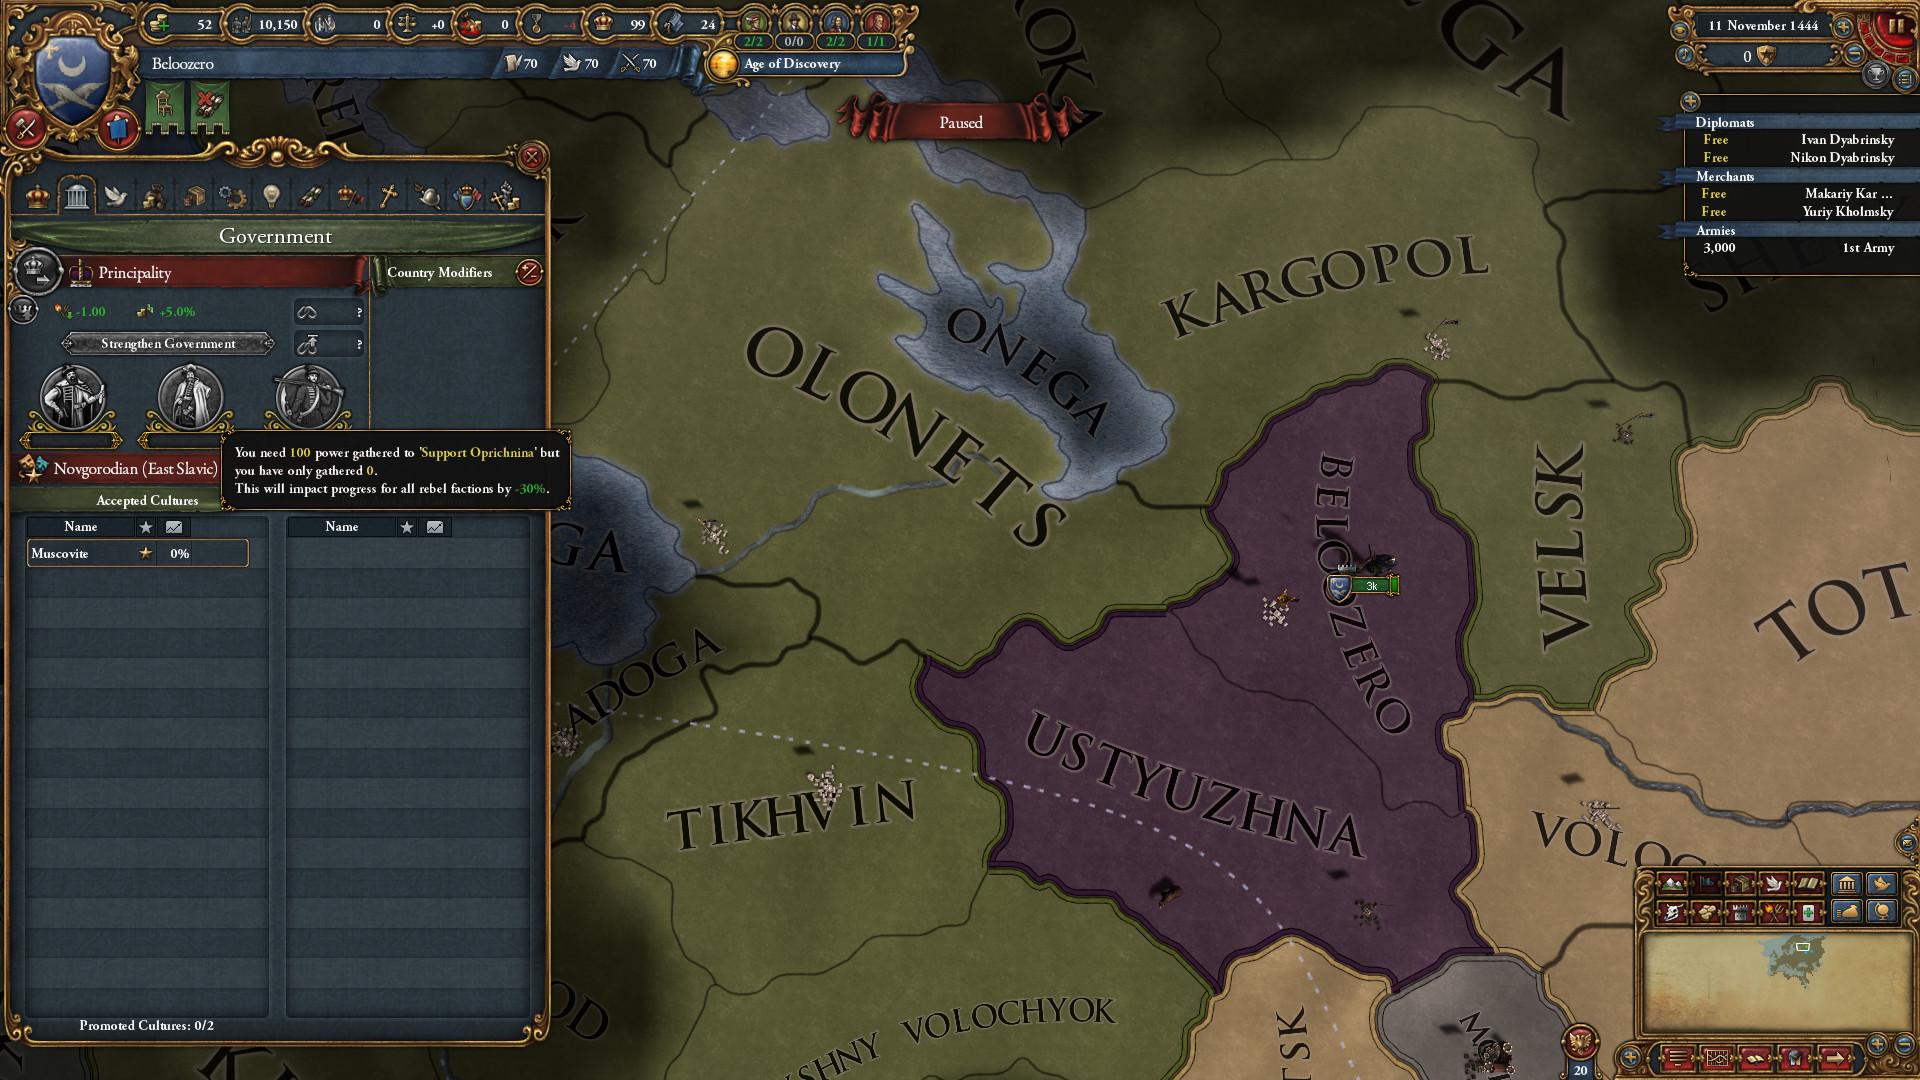 Europa Universalis IV: Third Rome Screenshot 1